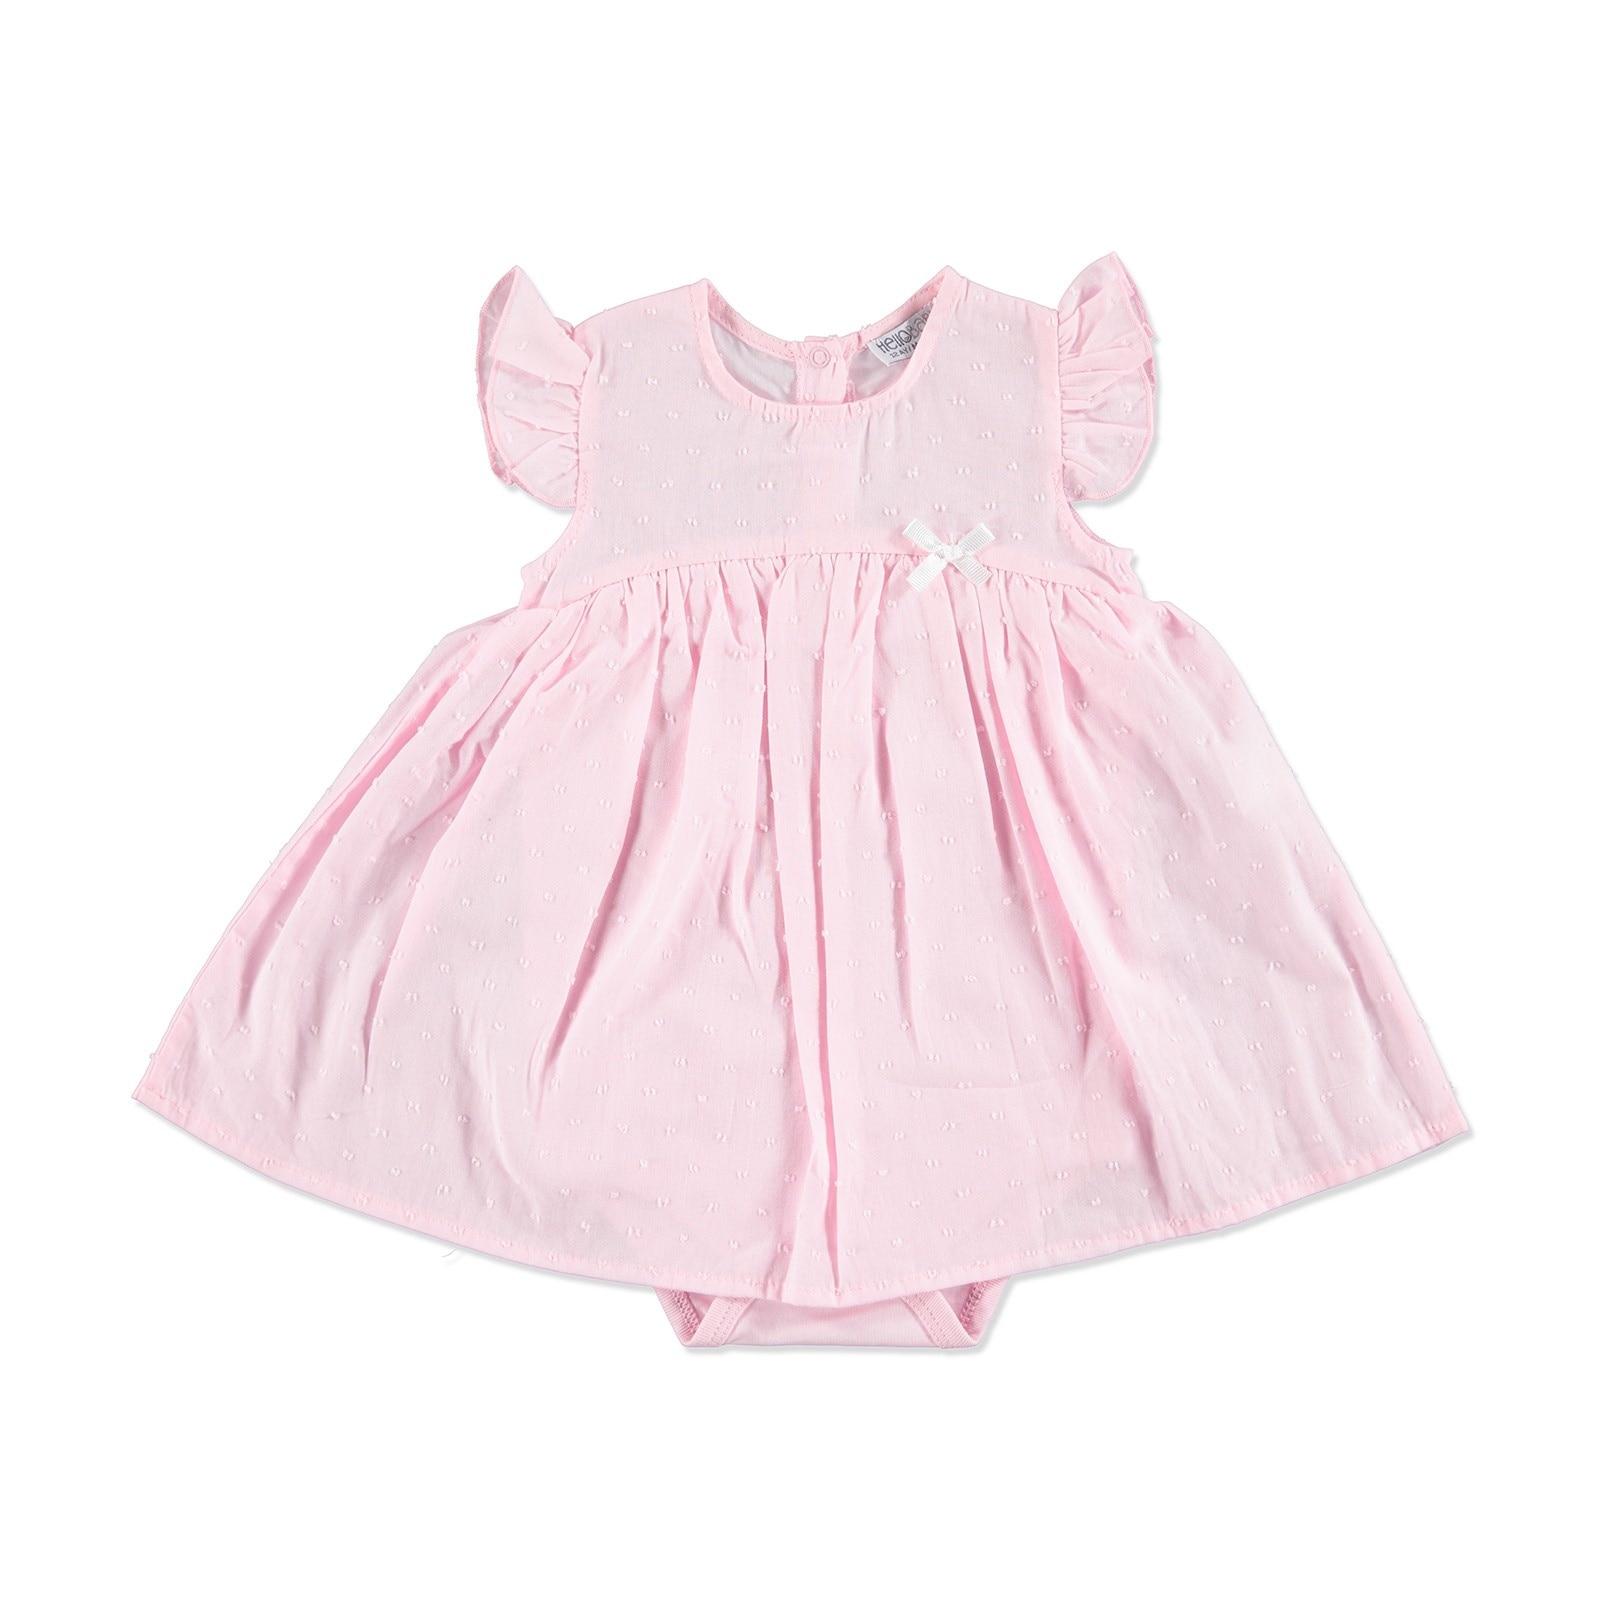 Ebebek HelloBaby Summer Baby The Cutiest Patterned Dress Bodysuit